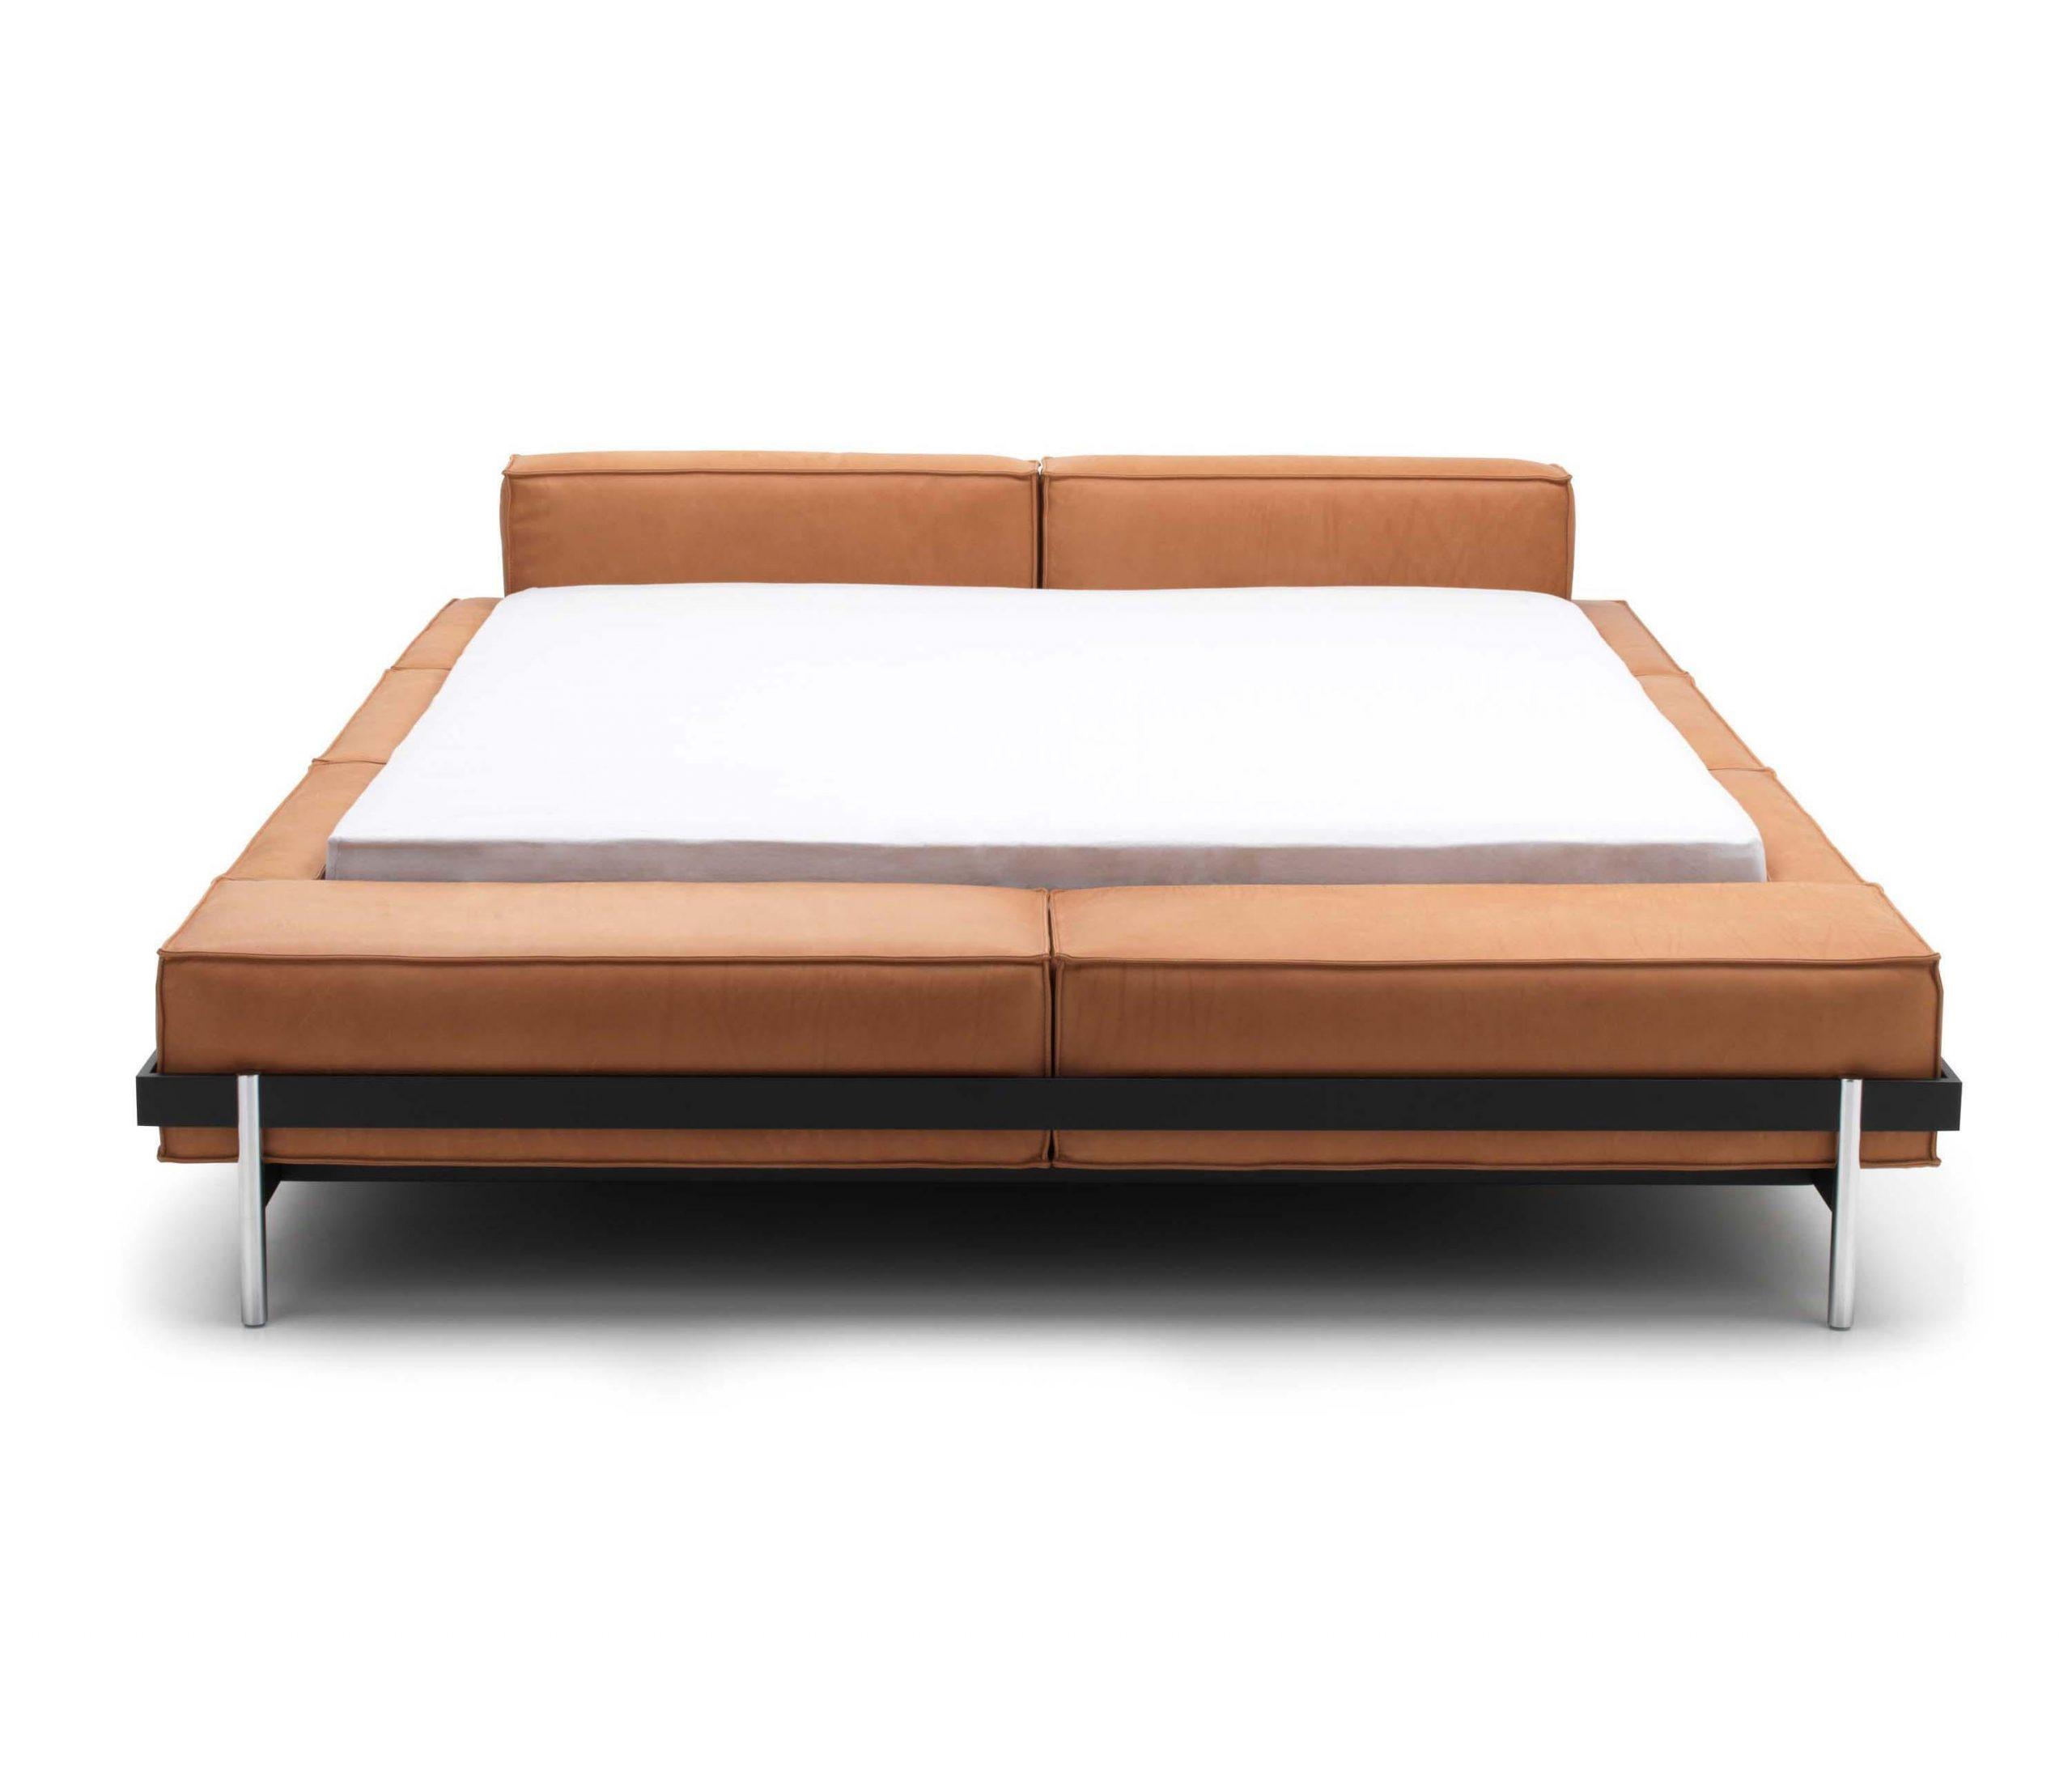 Full Size of Ds 1121 Betten Von De Sede Architonic Bett Betten.de